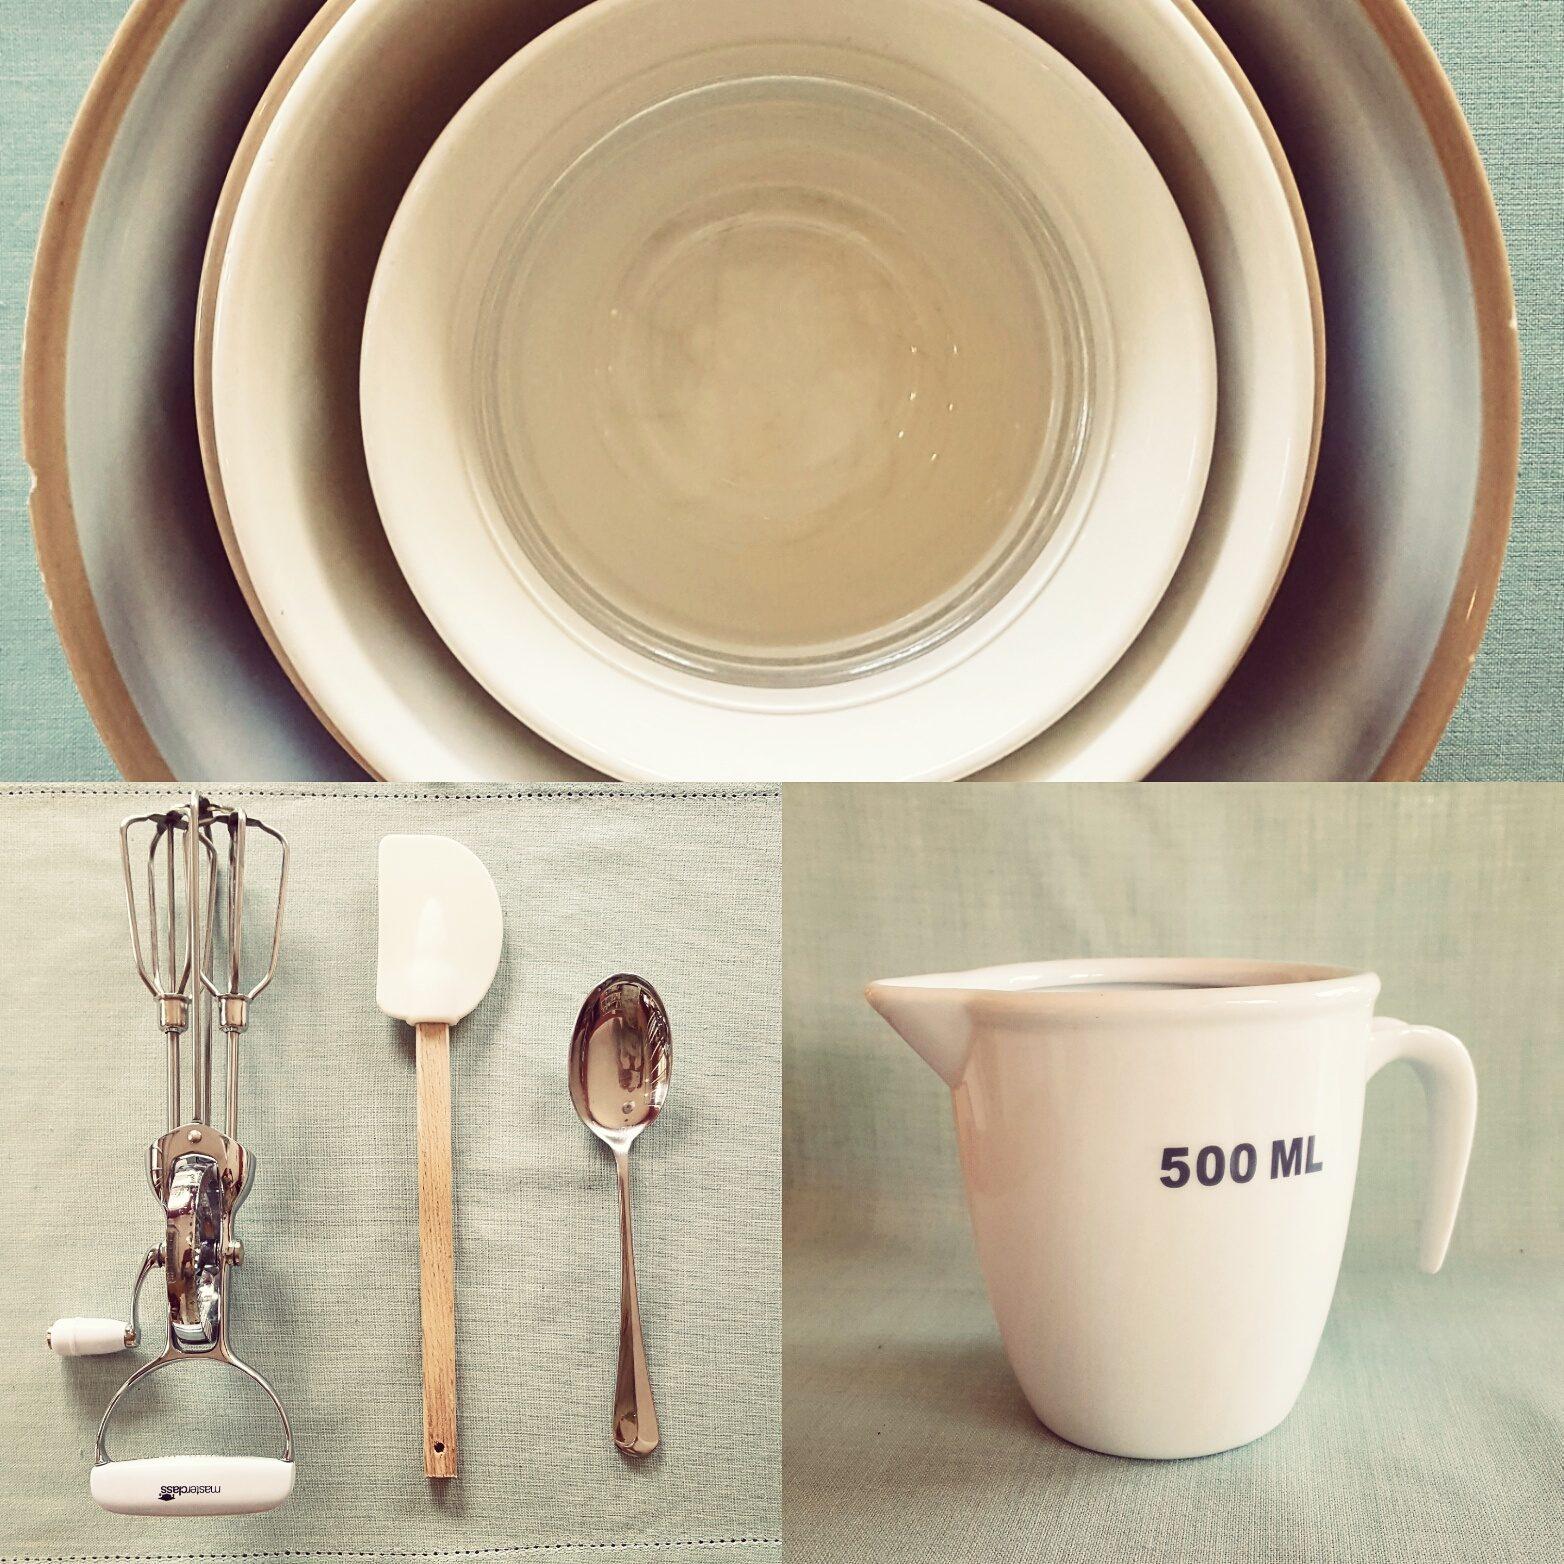 Essential cooking equipment